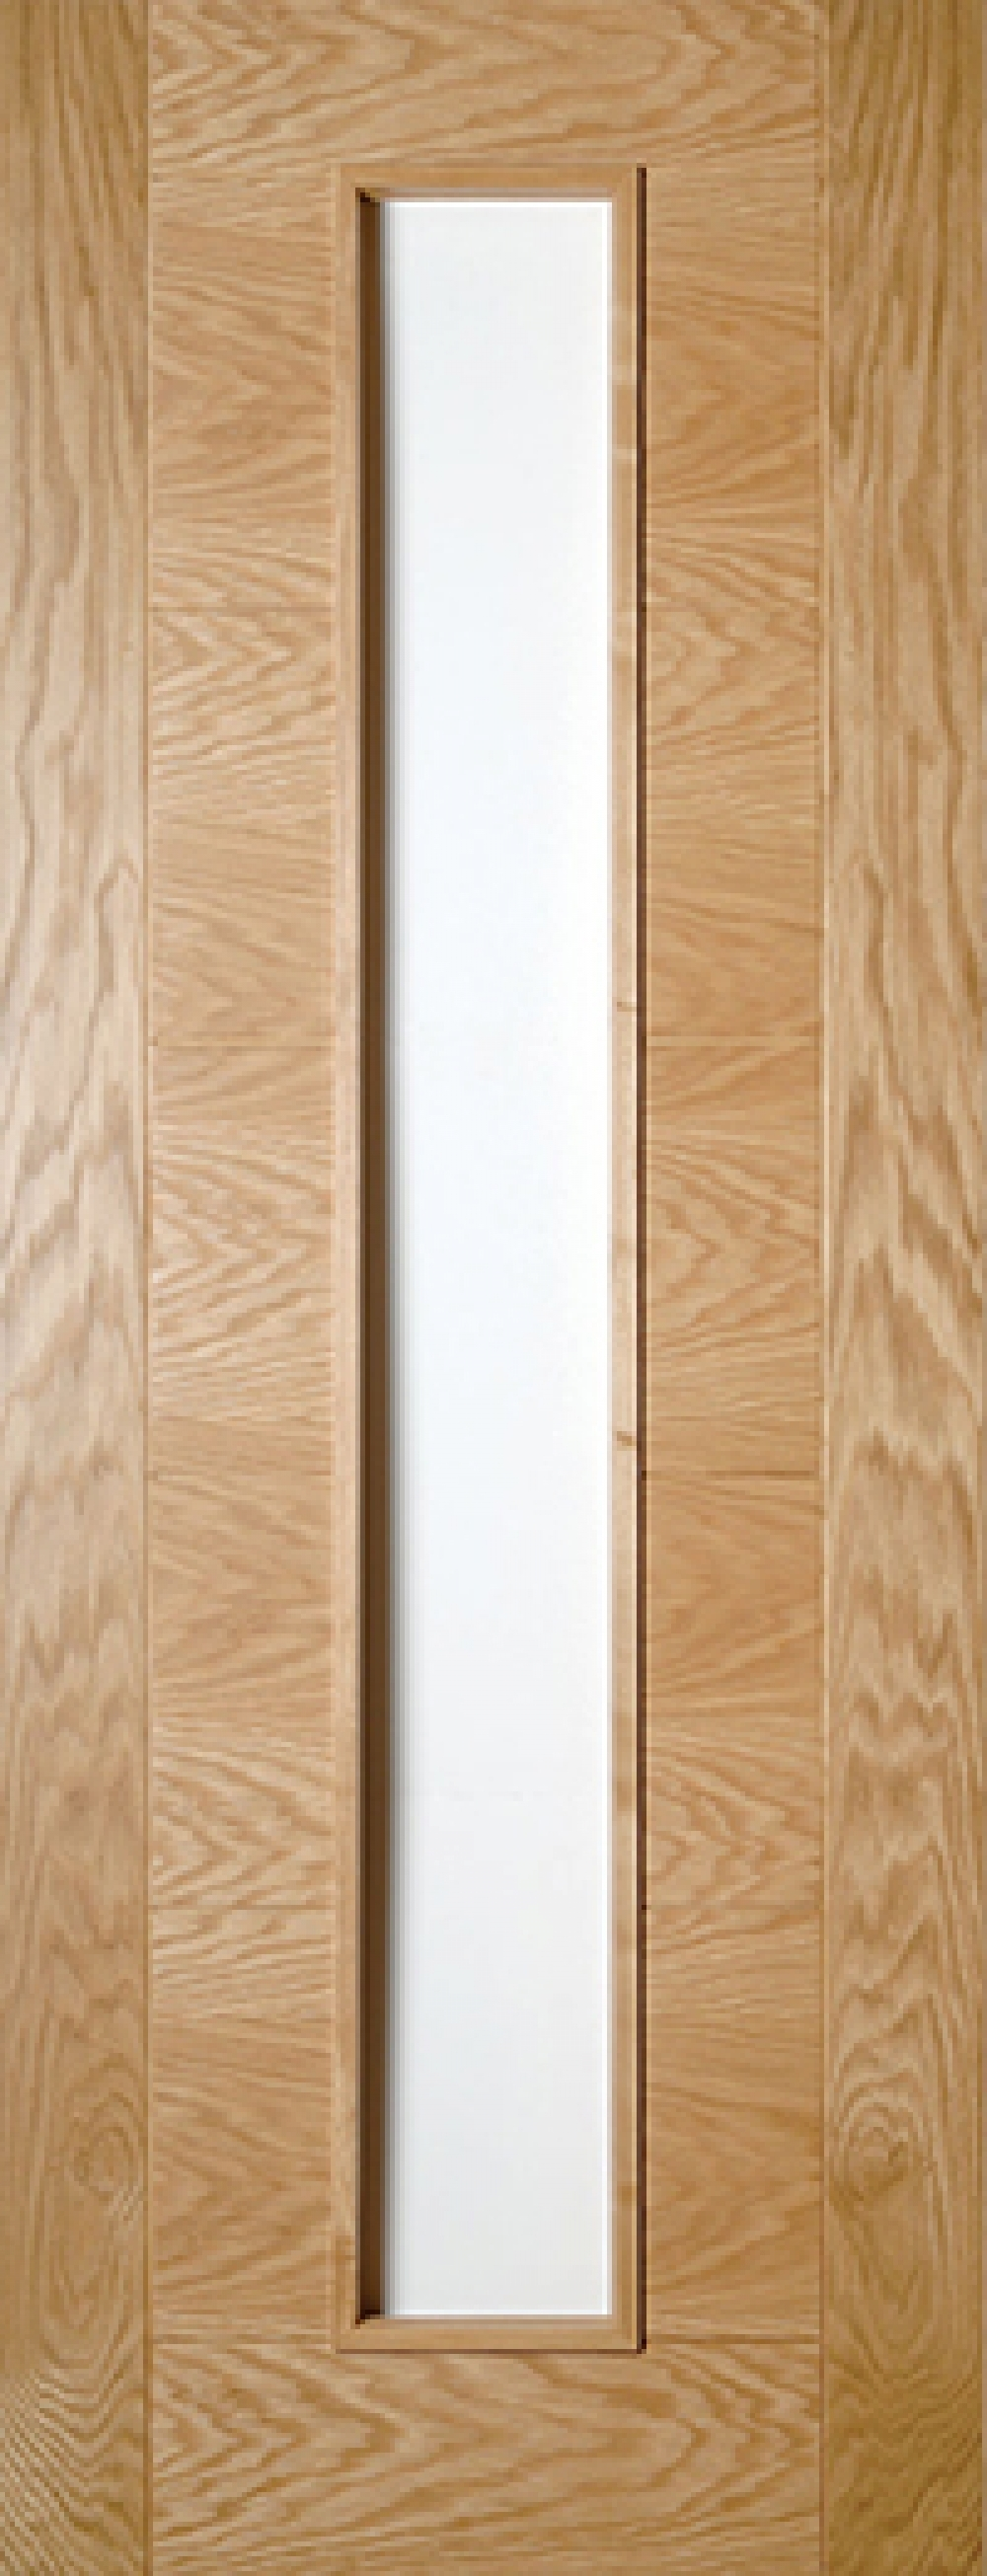 Seville Oak Door Unglazed - Prefinished